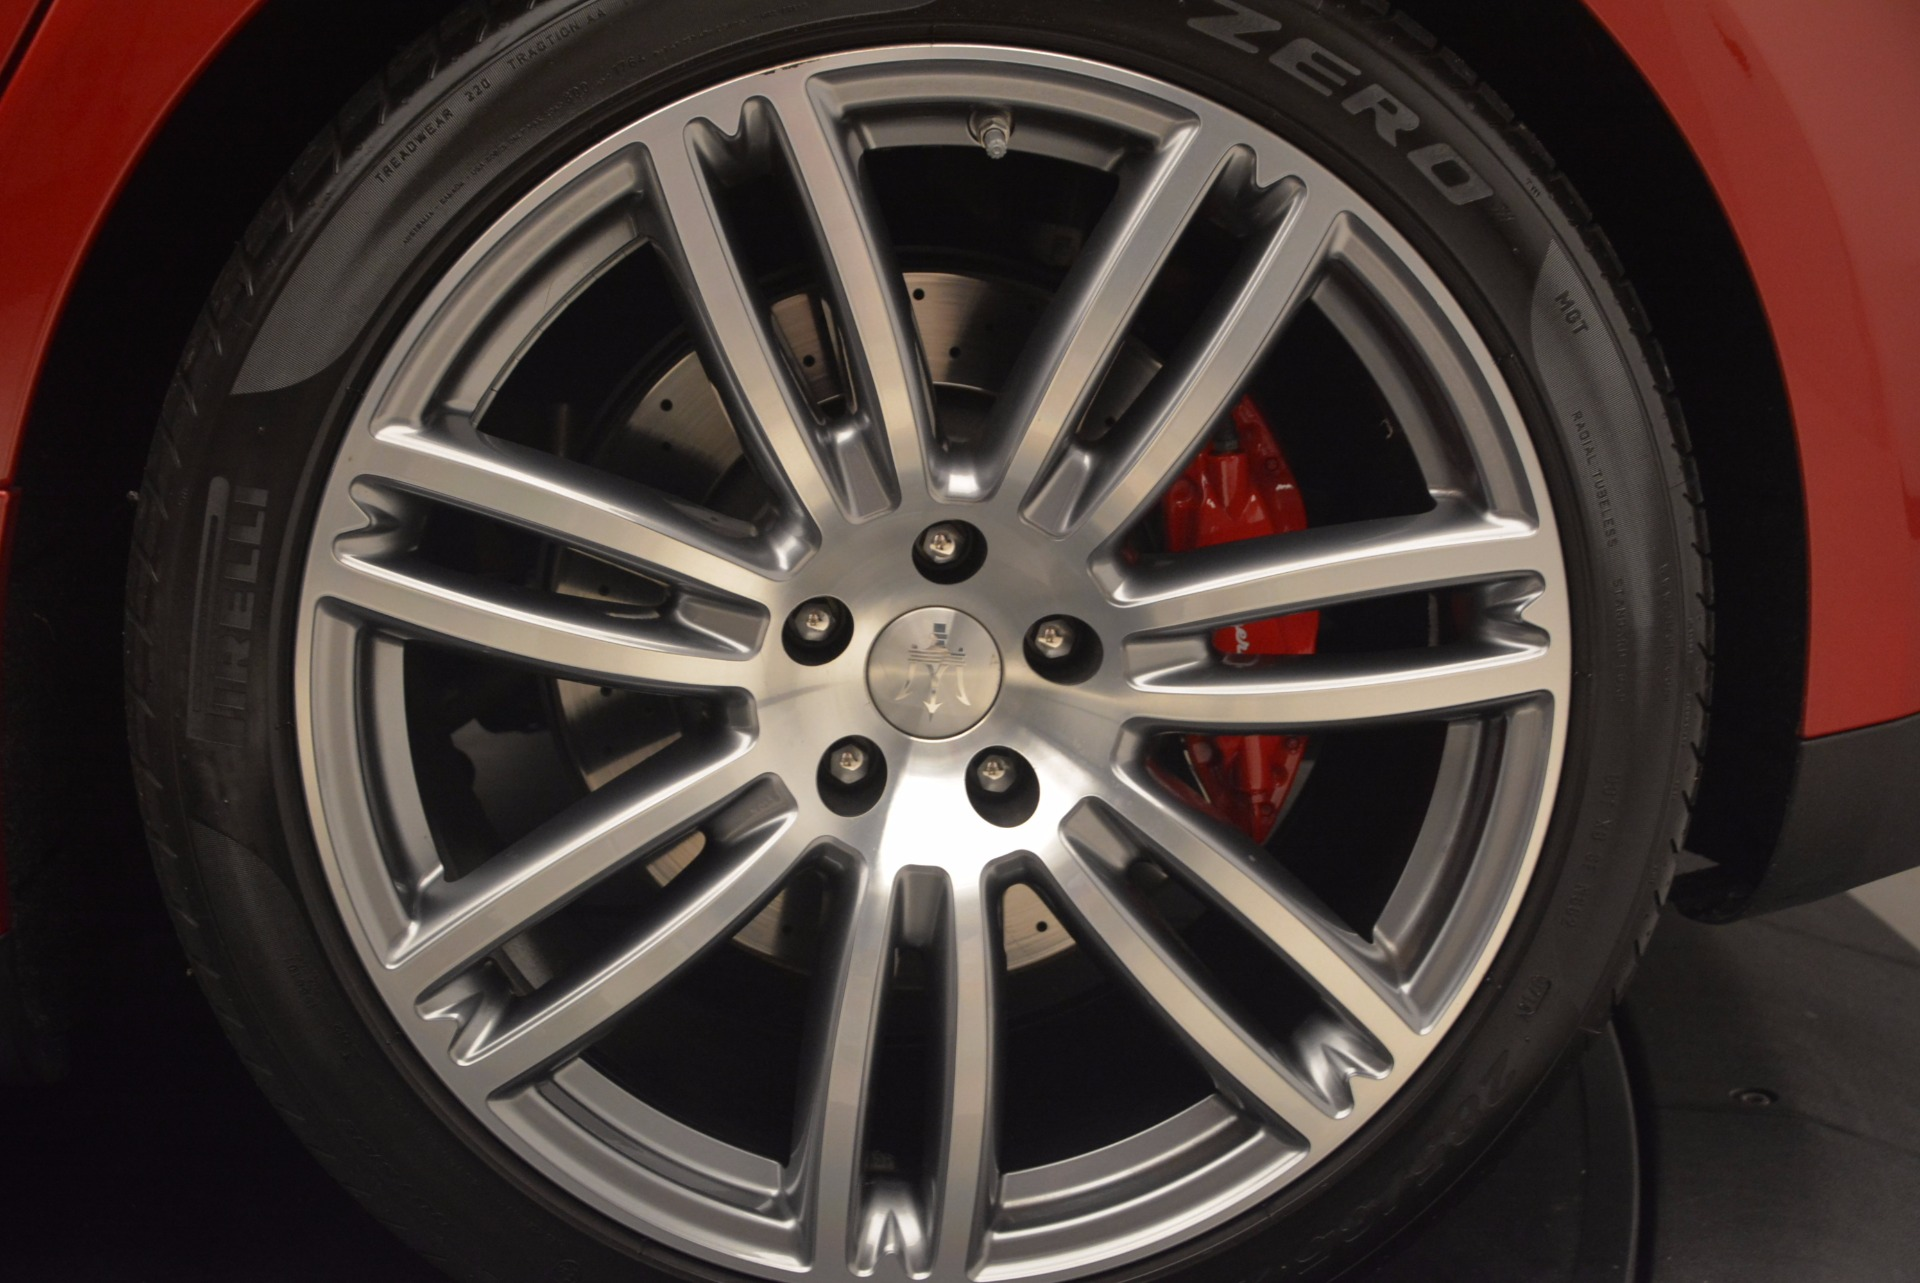 Used 2014 Maserati Ghibli S Q4 For Sale In Greenwich, CT. Alfa Romeo of Greenwich, 7203 1158_p25